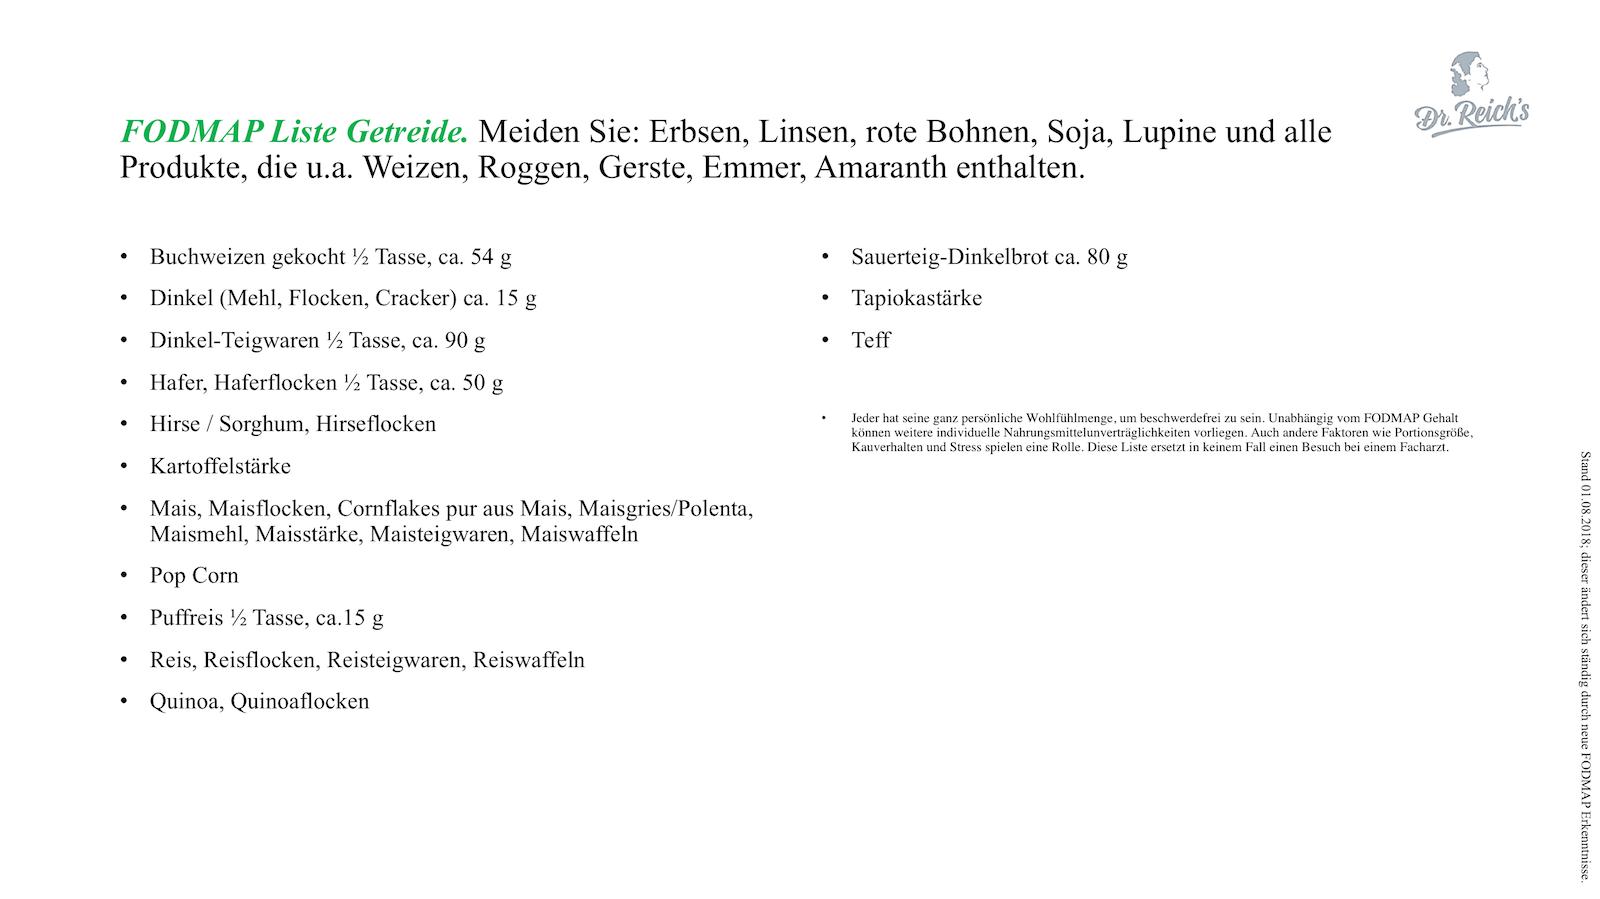 FODMAP Liste Getreide